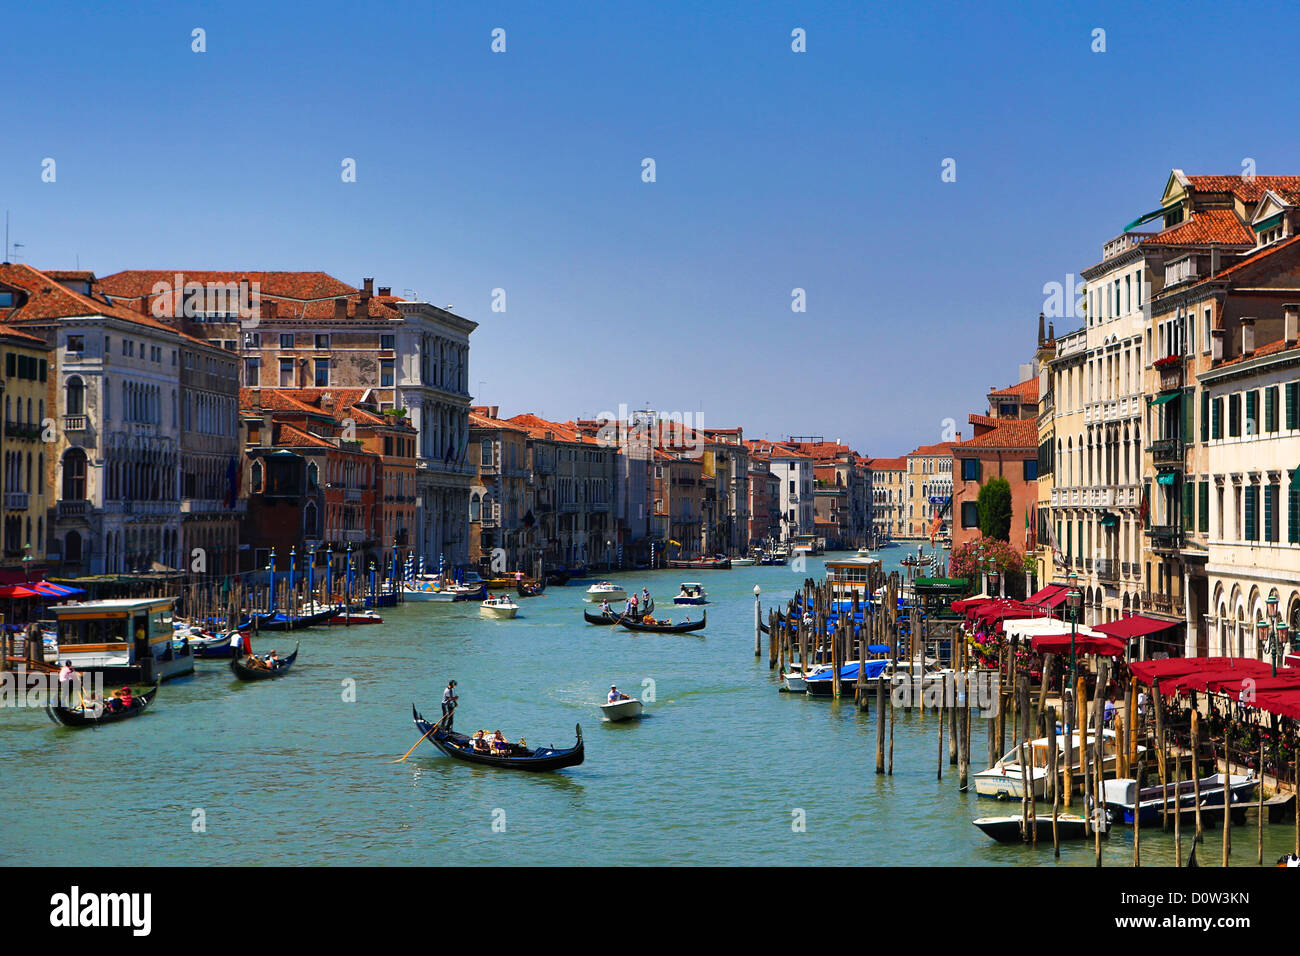 Italy, Europe, travel, Venice, Canal Grande, boats, gondola, tourism, Unesco, - Stock Image